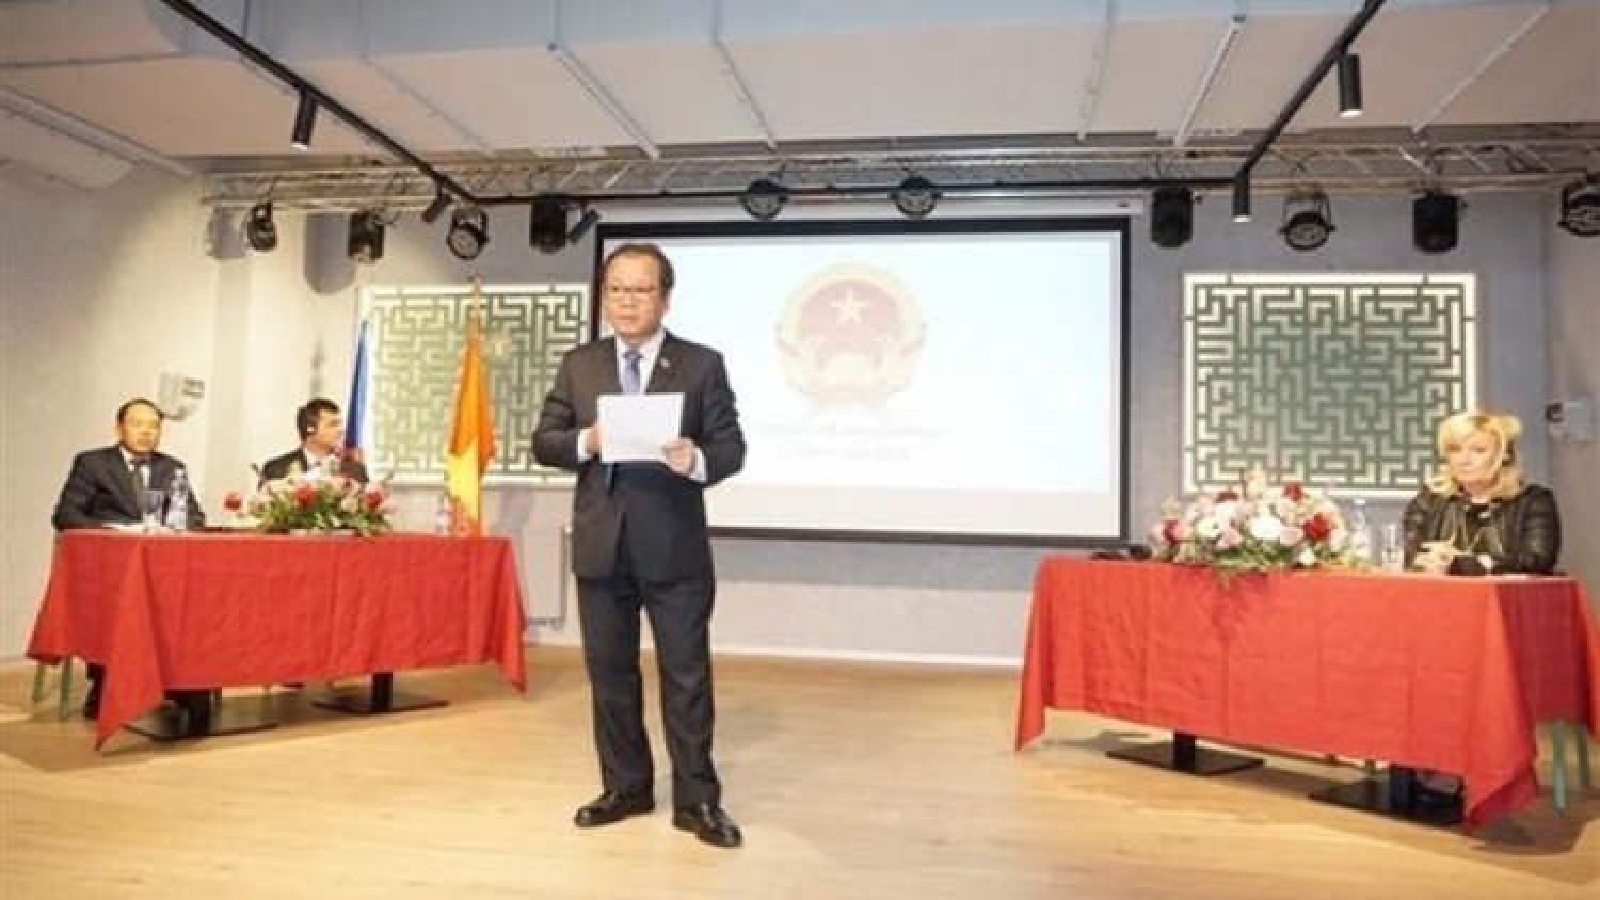 Czechia-Vietnam trade forum explores opportunities from EVFTA